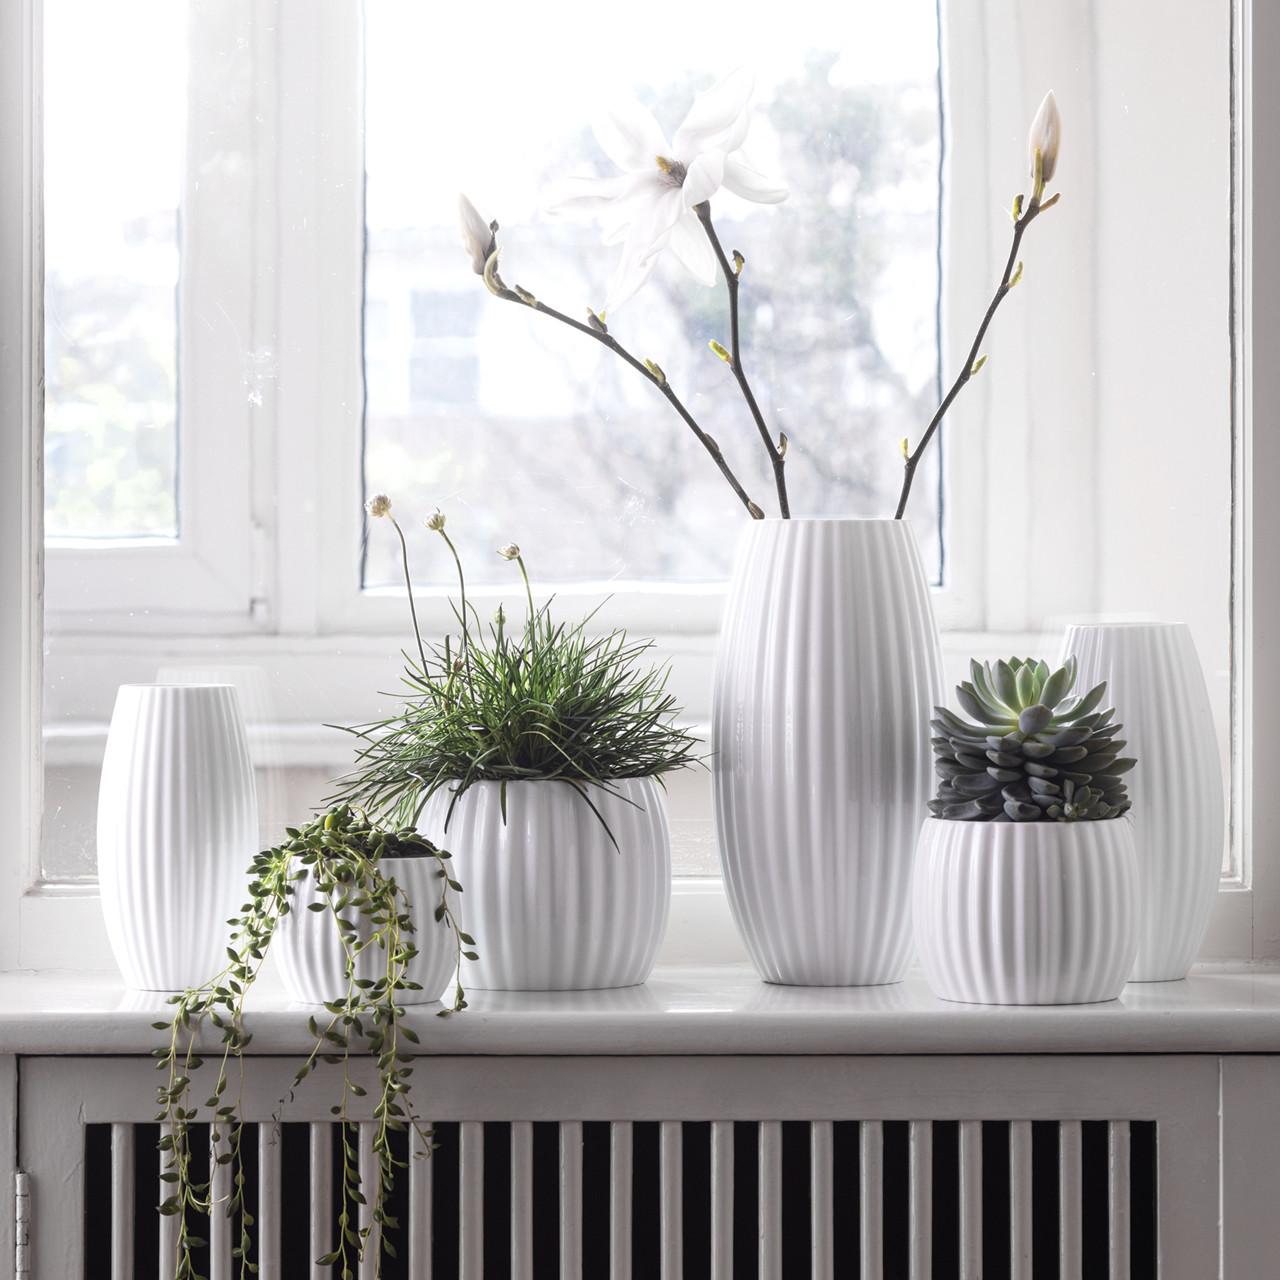 Cr ton maison flora urtepotte stor k b her for Creton maison